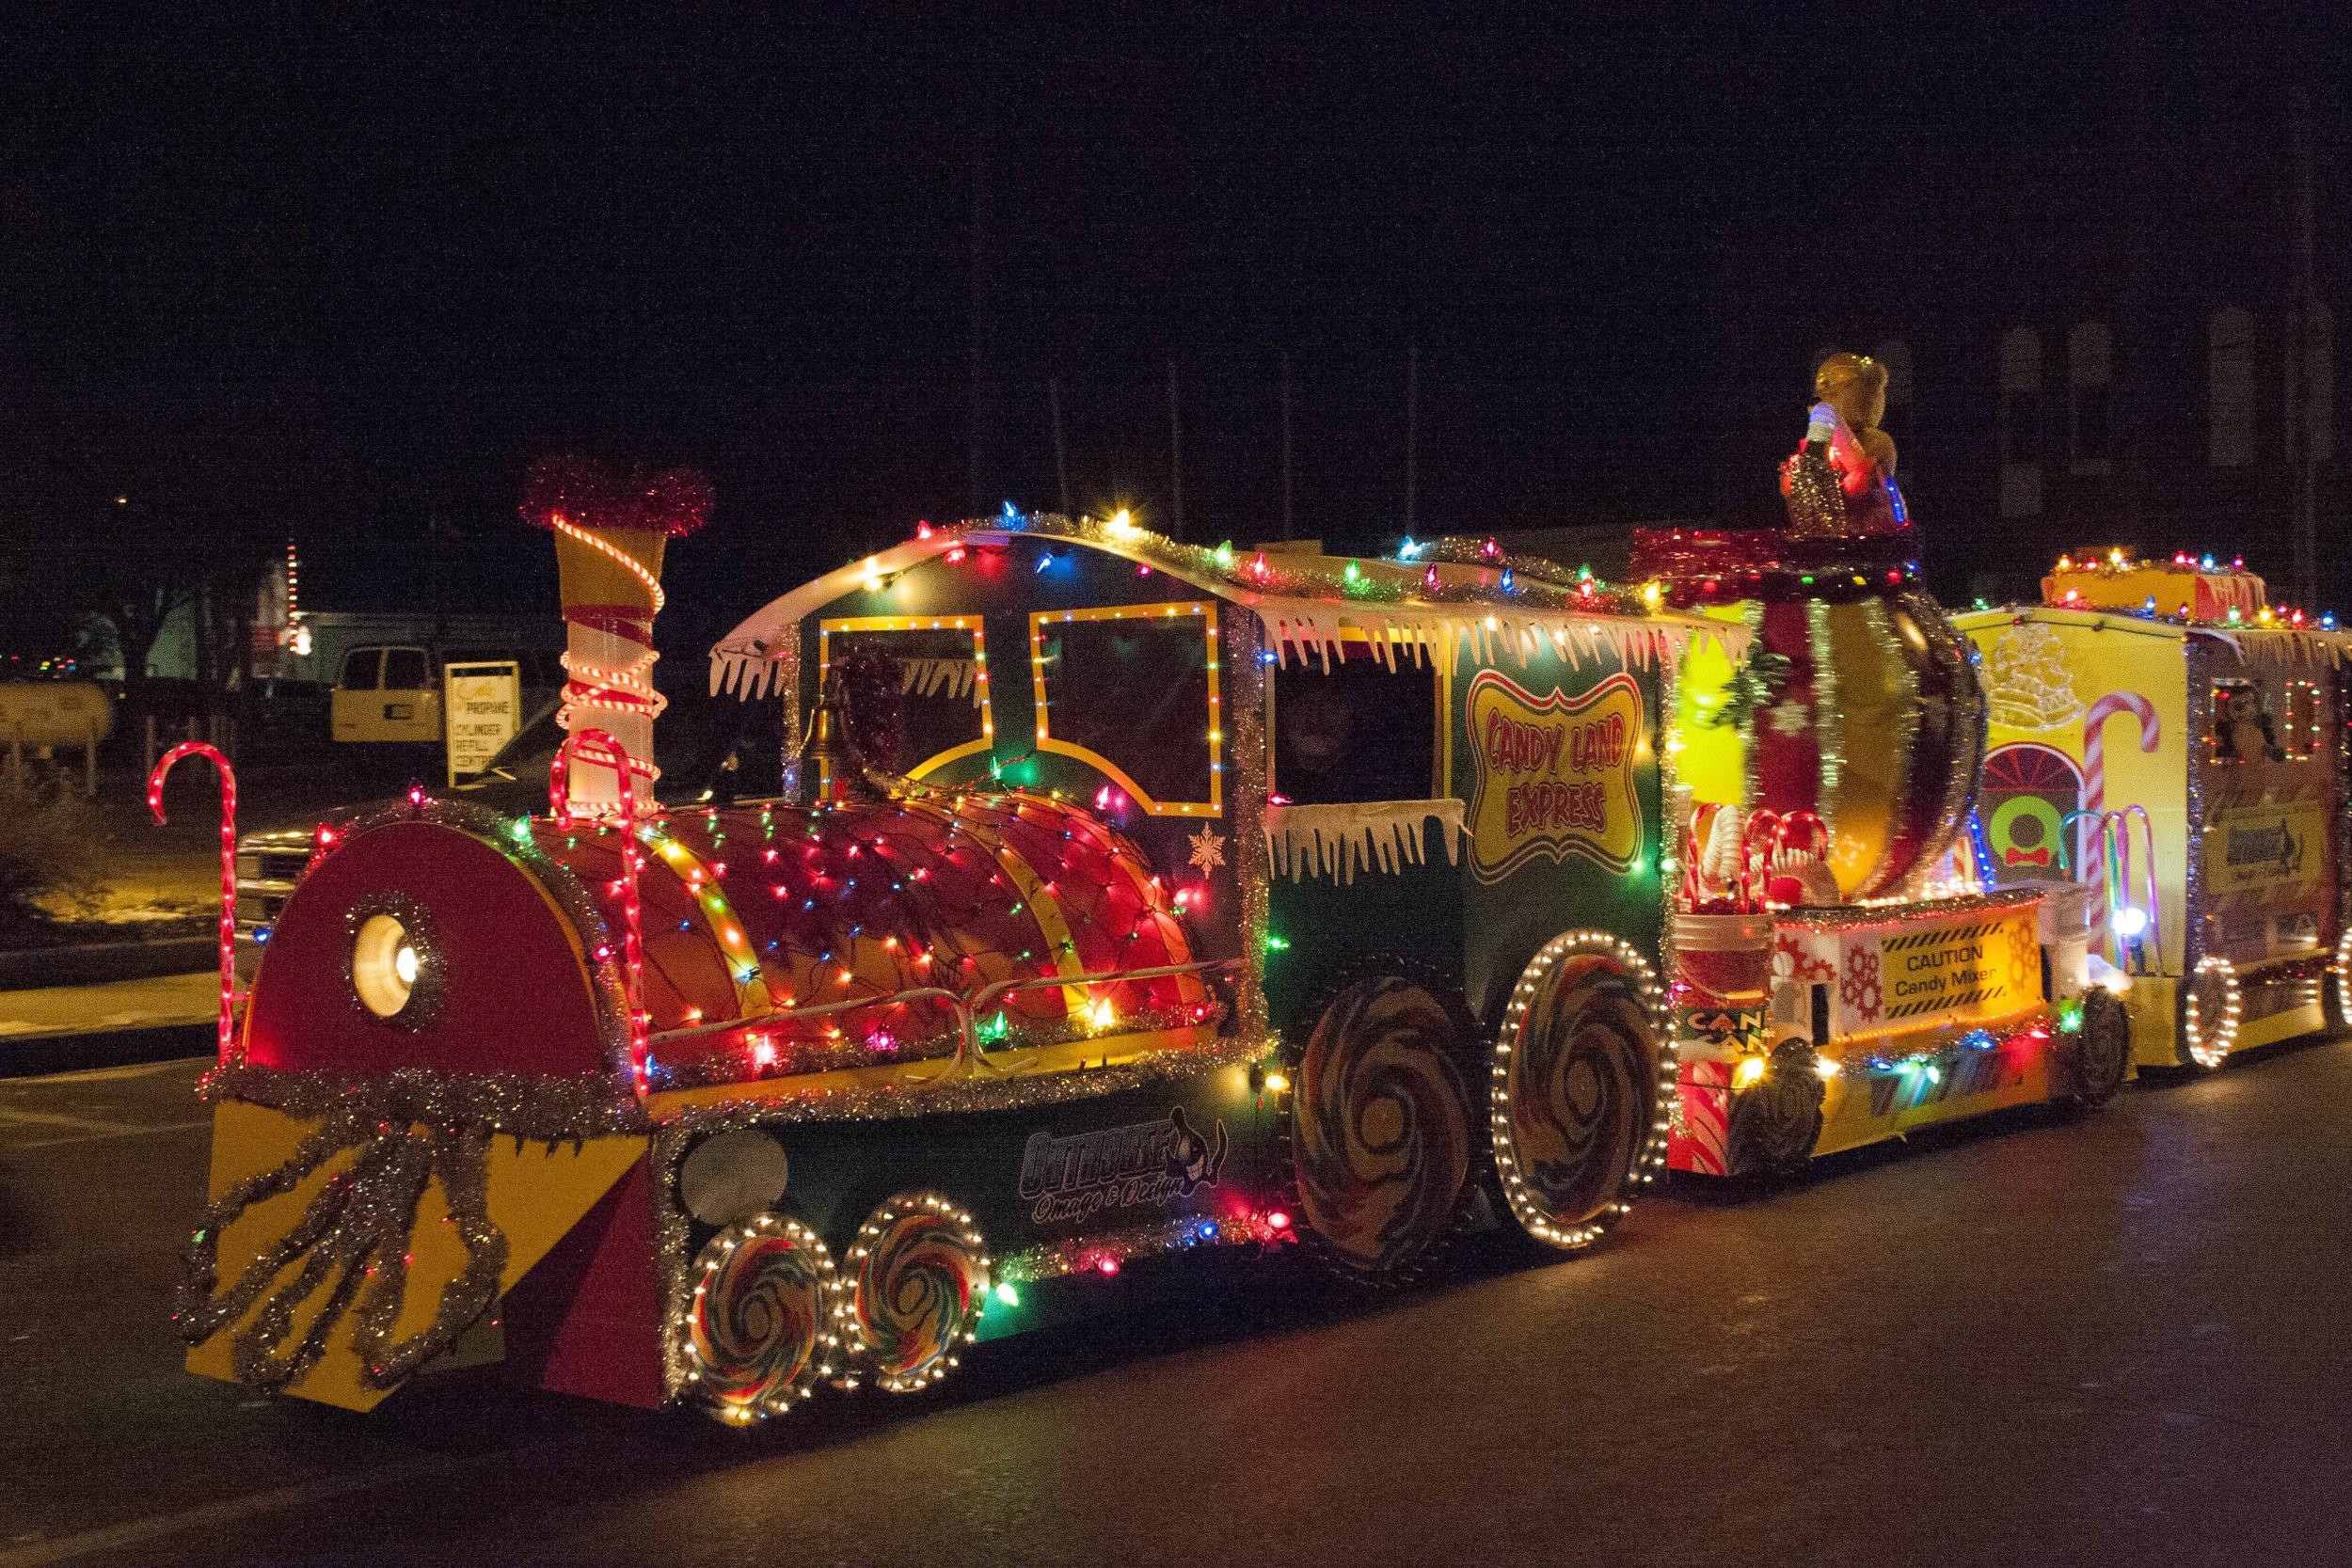 Day 13 - Christmas Parade